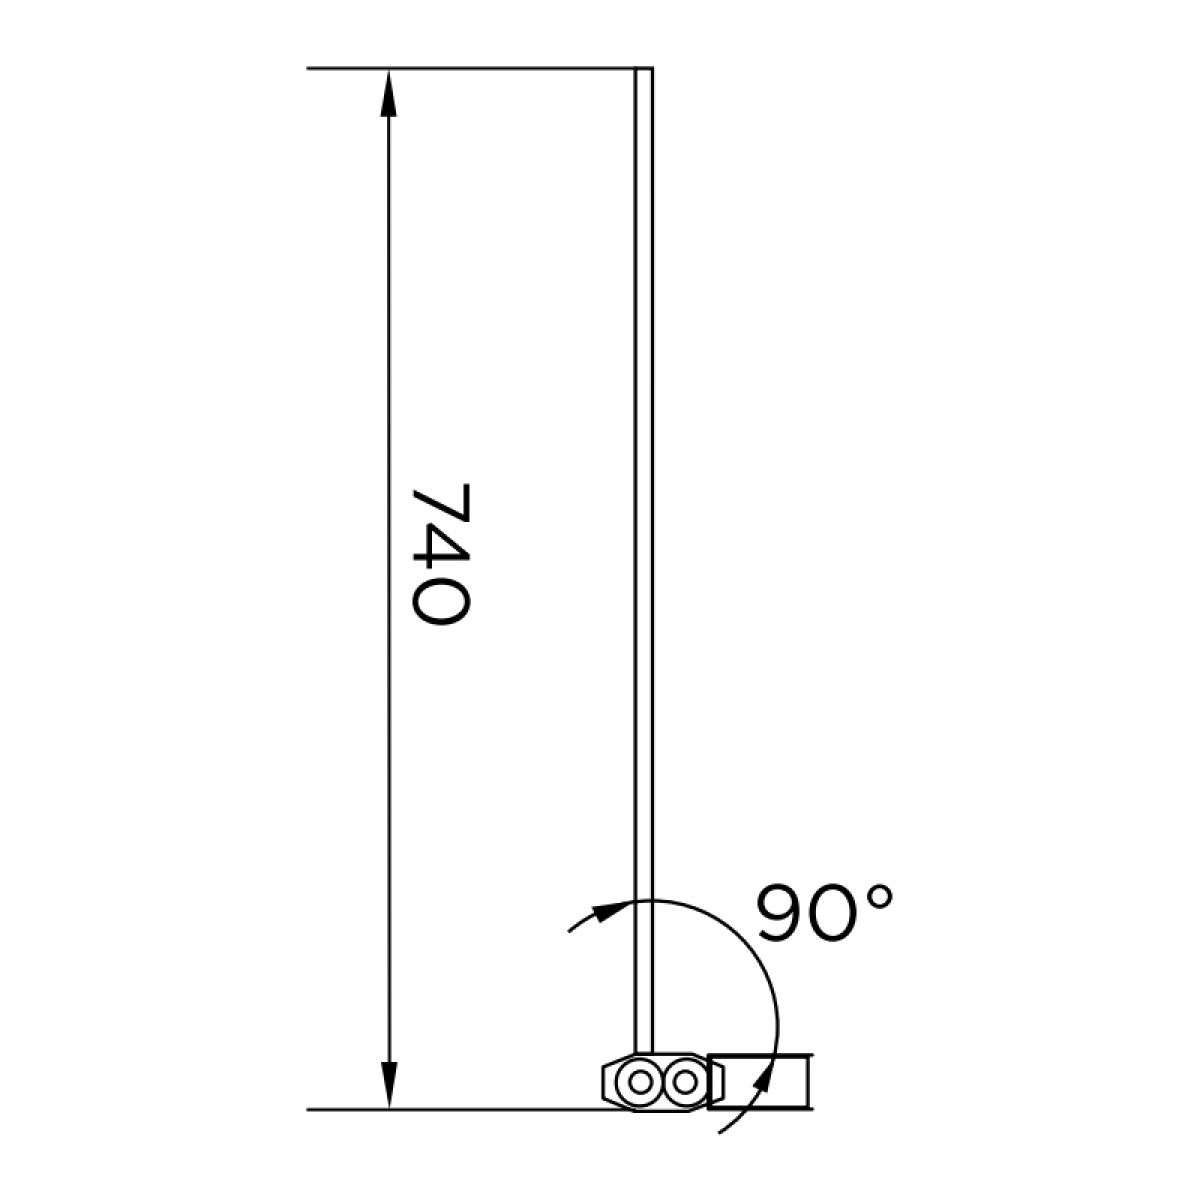 Aquadart Venturi 6 Single Bath Shower Screen Dimensions